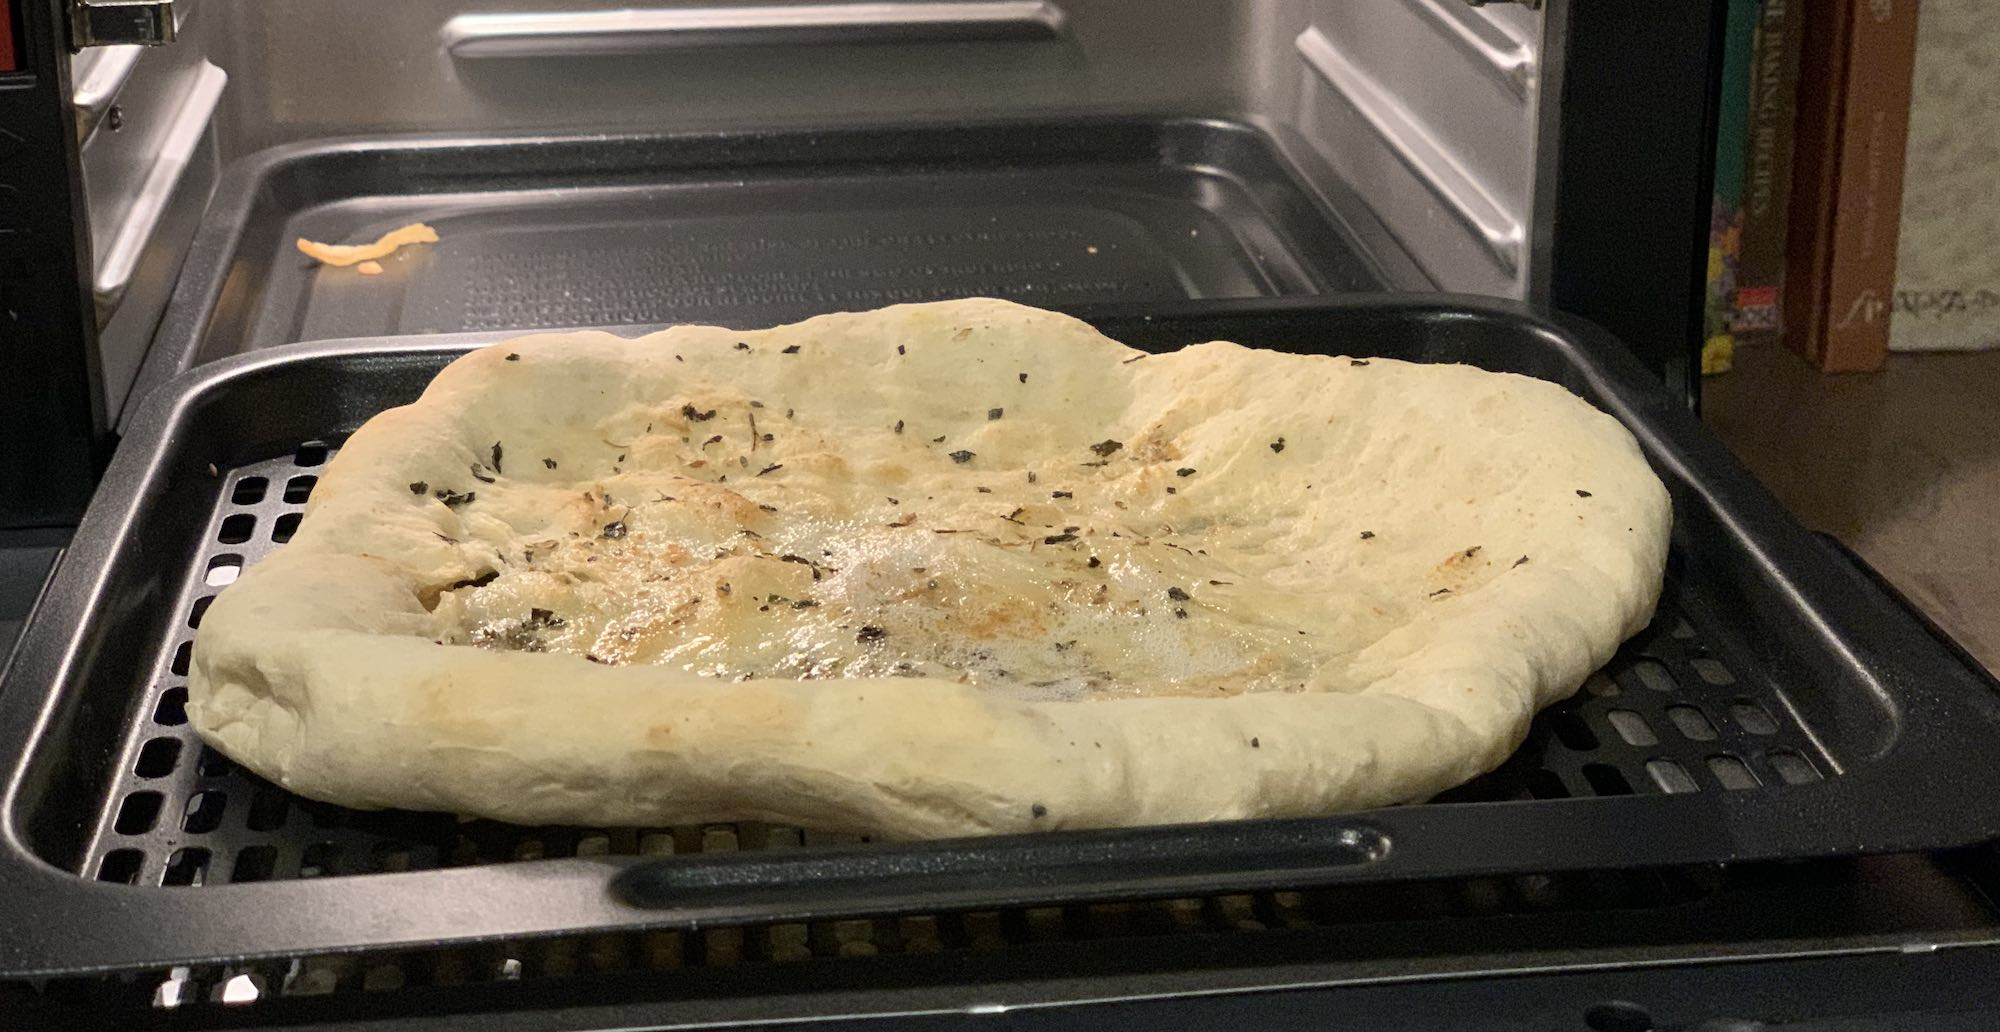 Pizza bread in air fryer